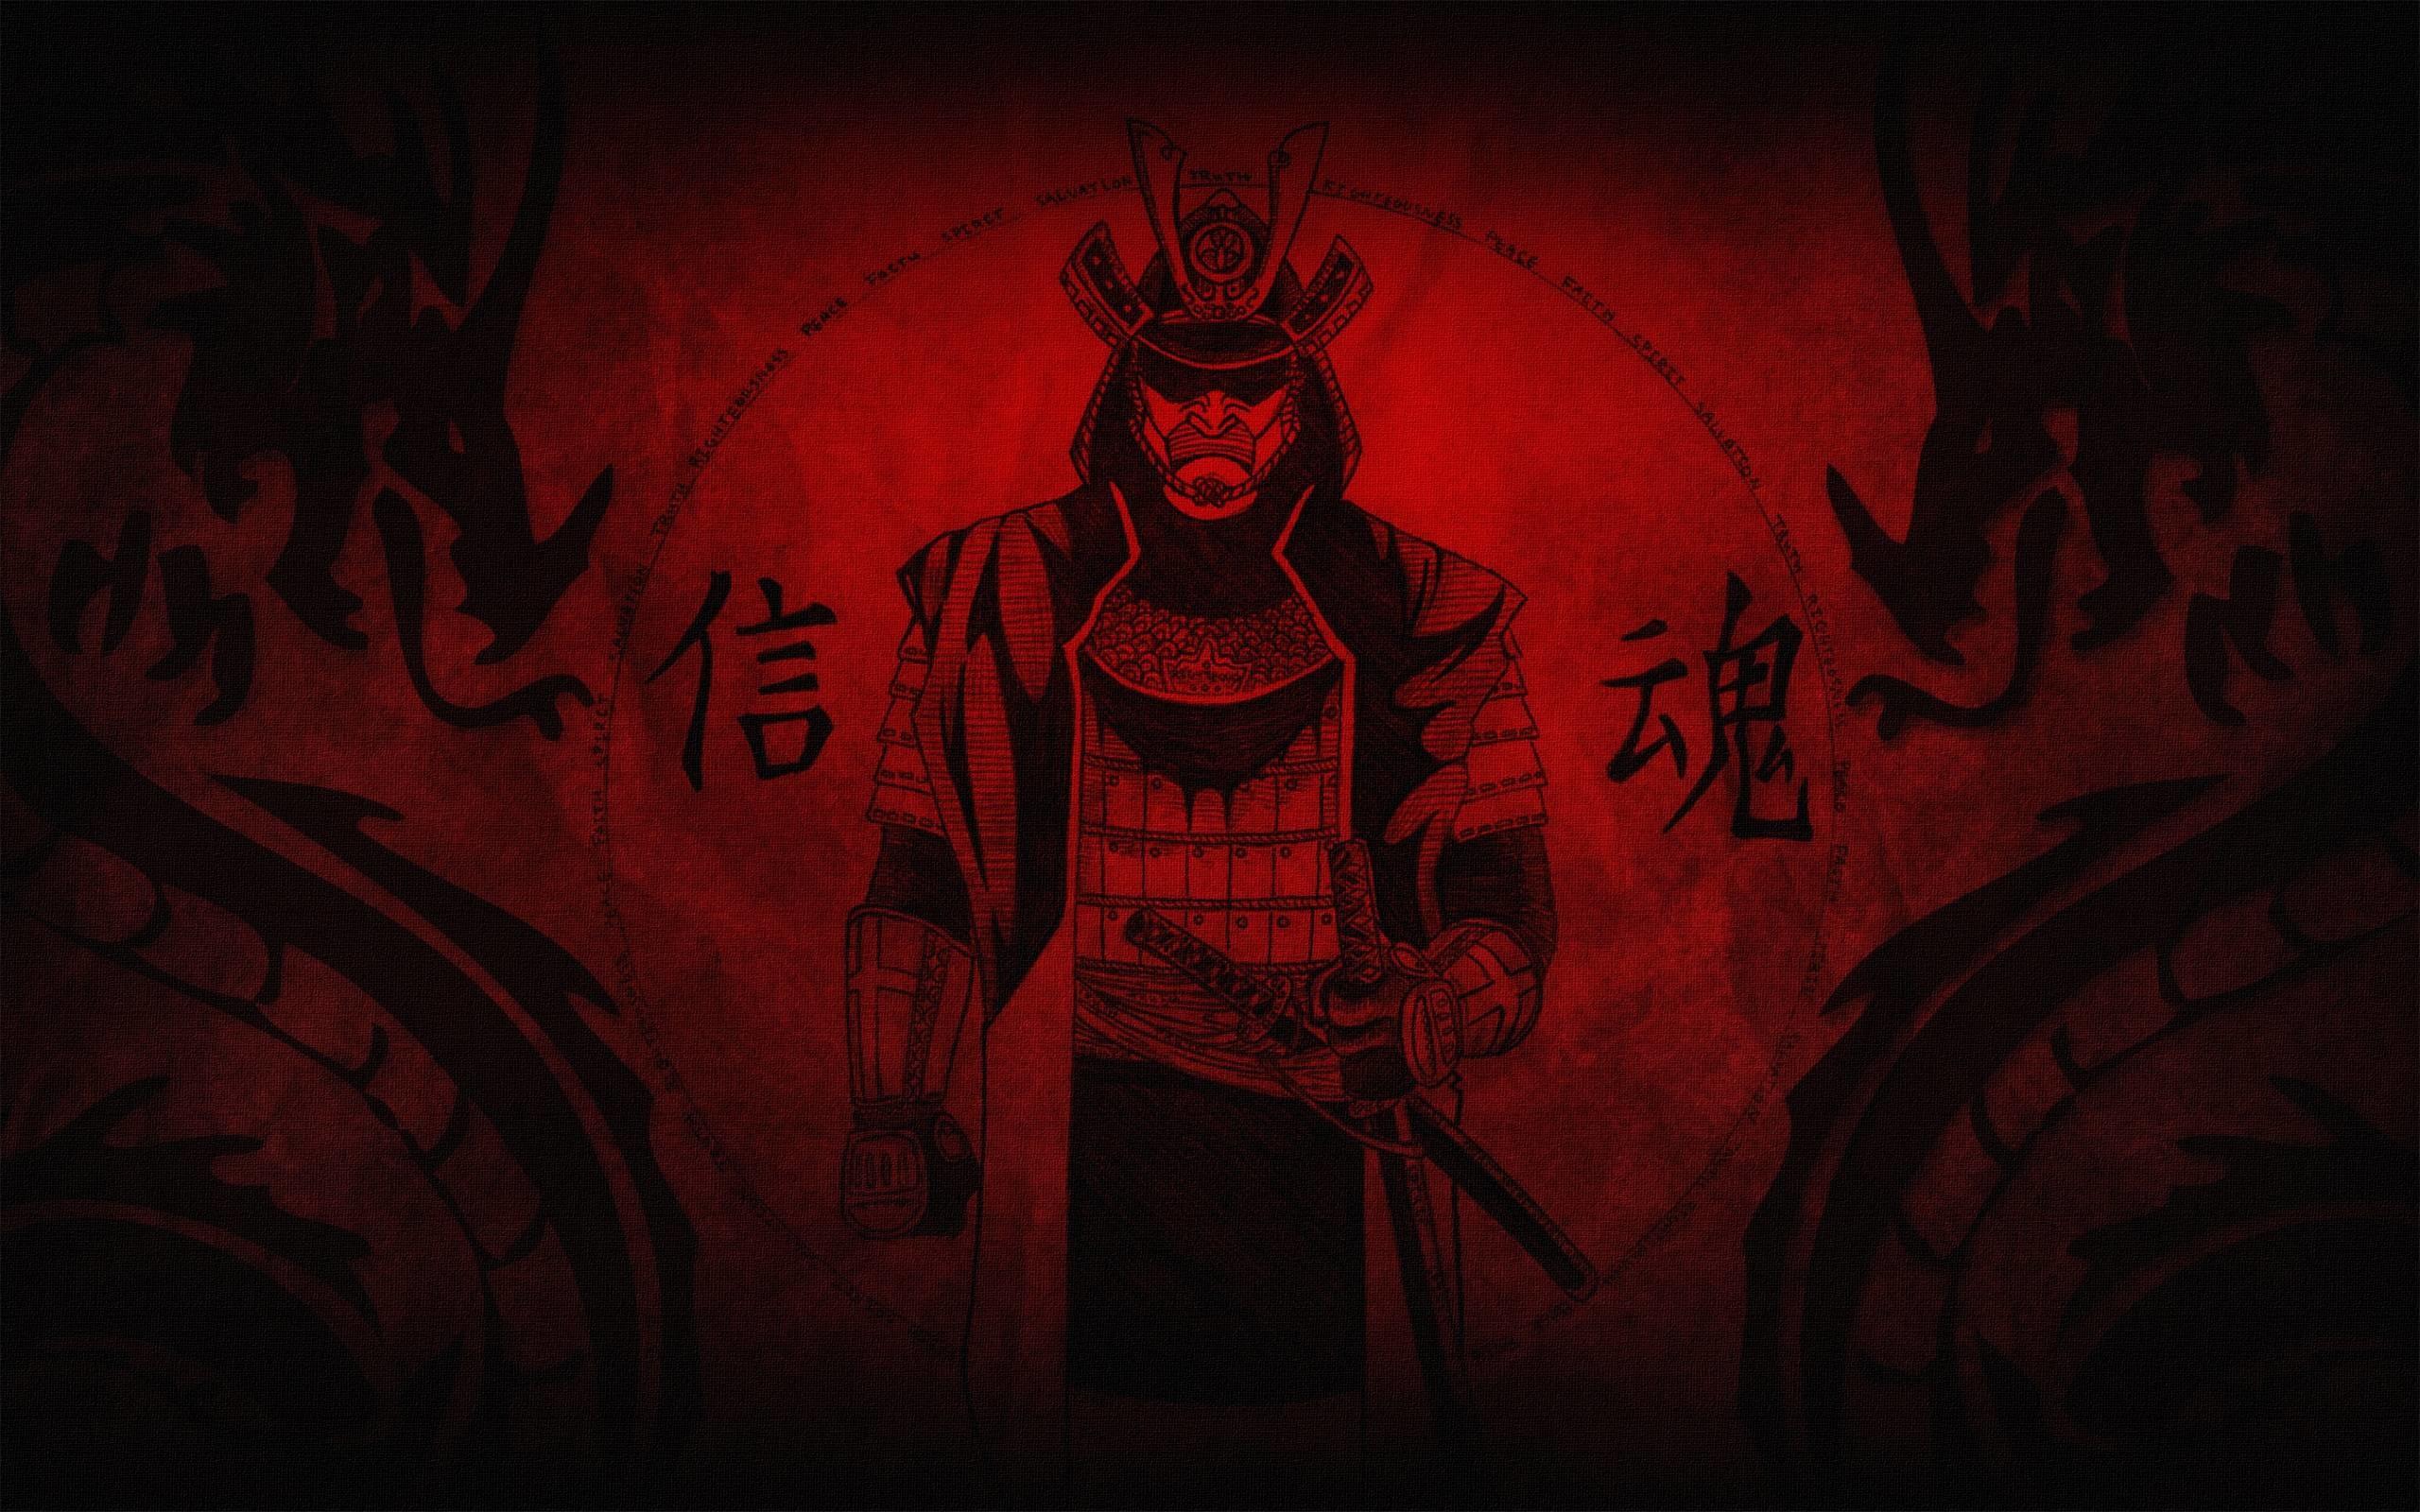 Fantasy Samurai Wallpaper 1920×1200 px Free Download .